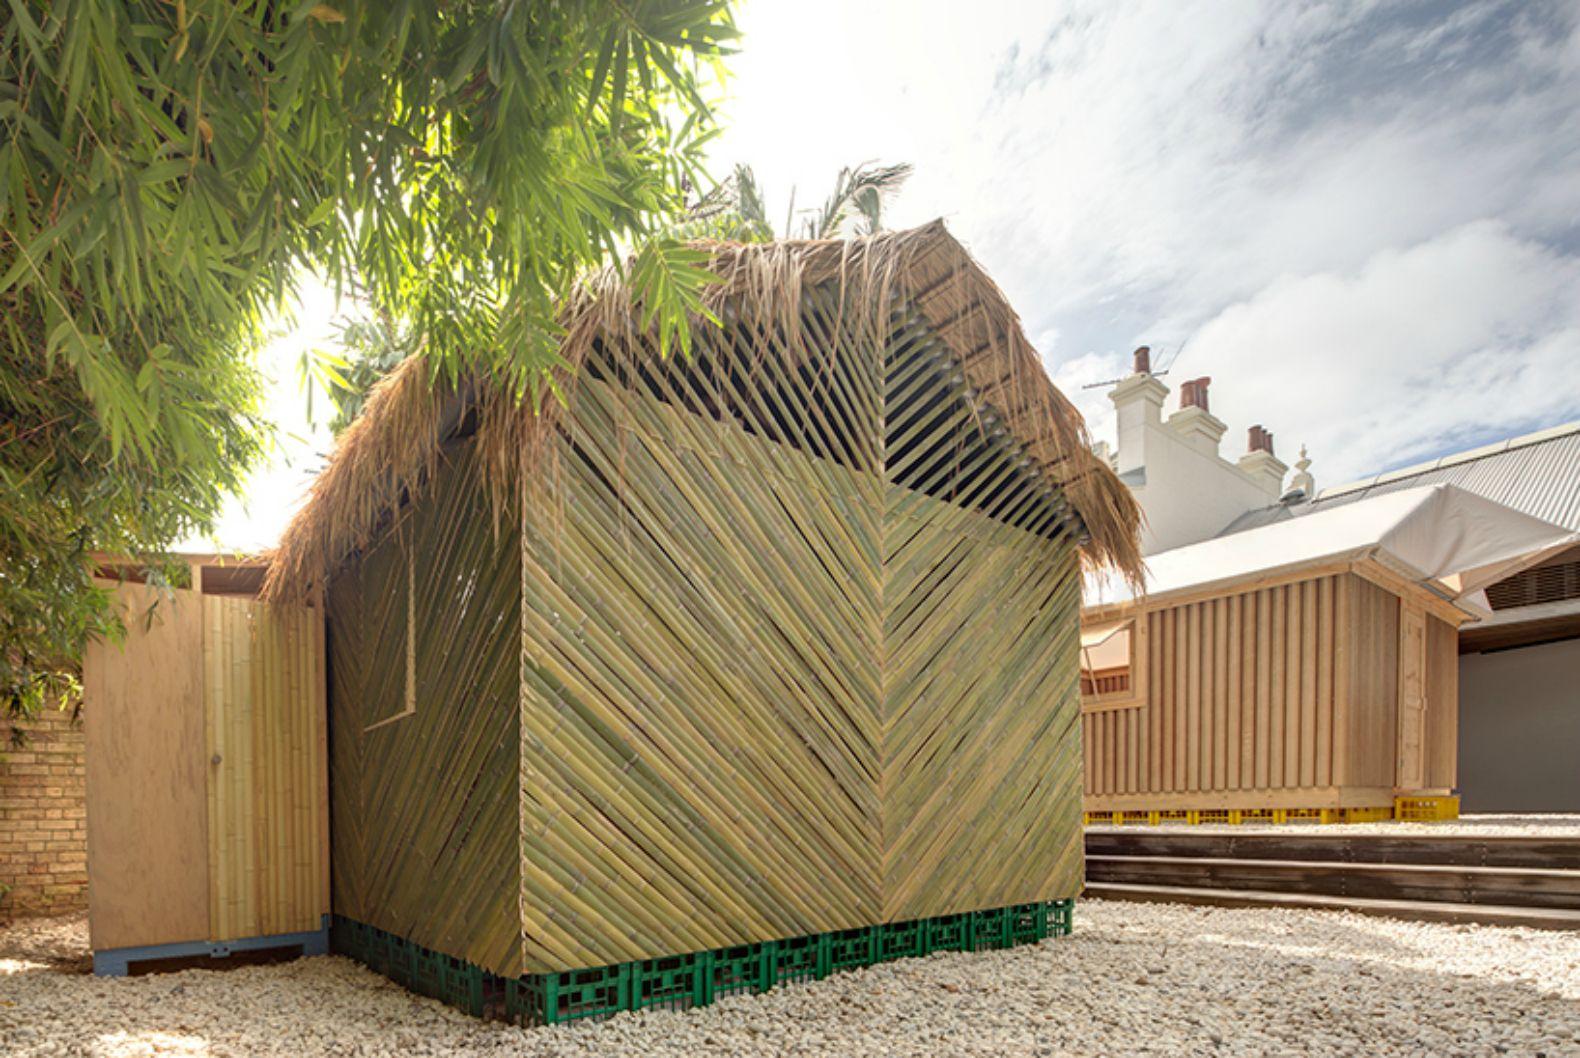 ingenious cardboard and bamboo